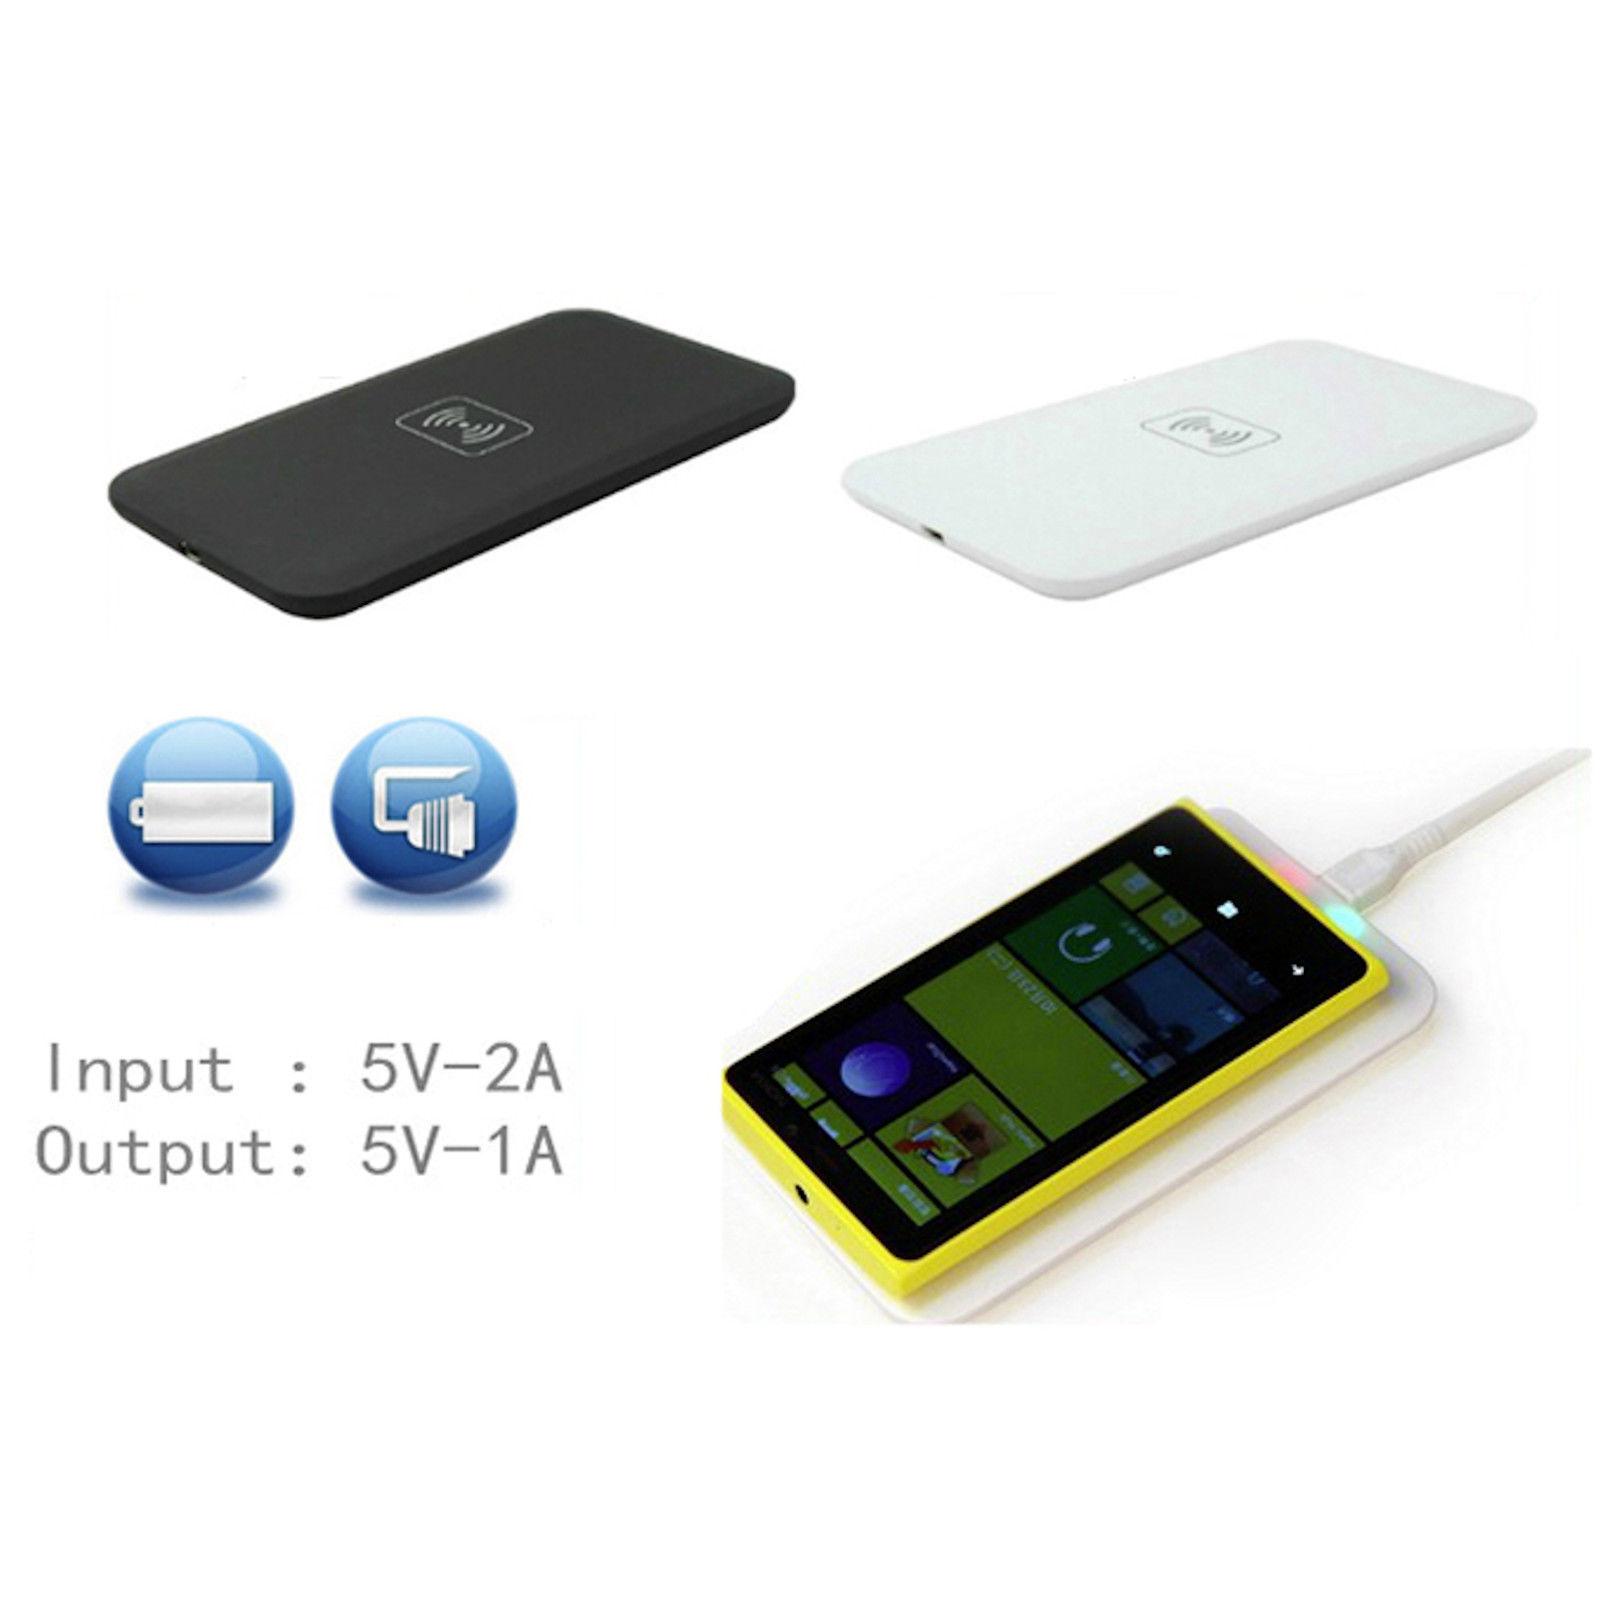 qi wireless ladeger t induktiv ladestation charger samsung galaxy s8 iphone 8 x ebay. Black Bedroom Furniture Sets. Home Design Ideas